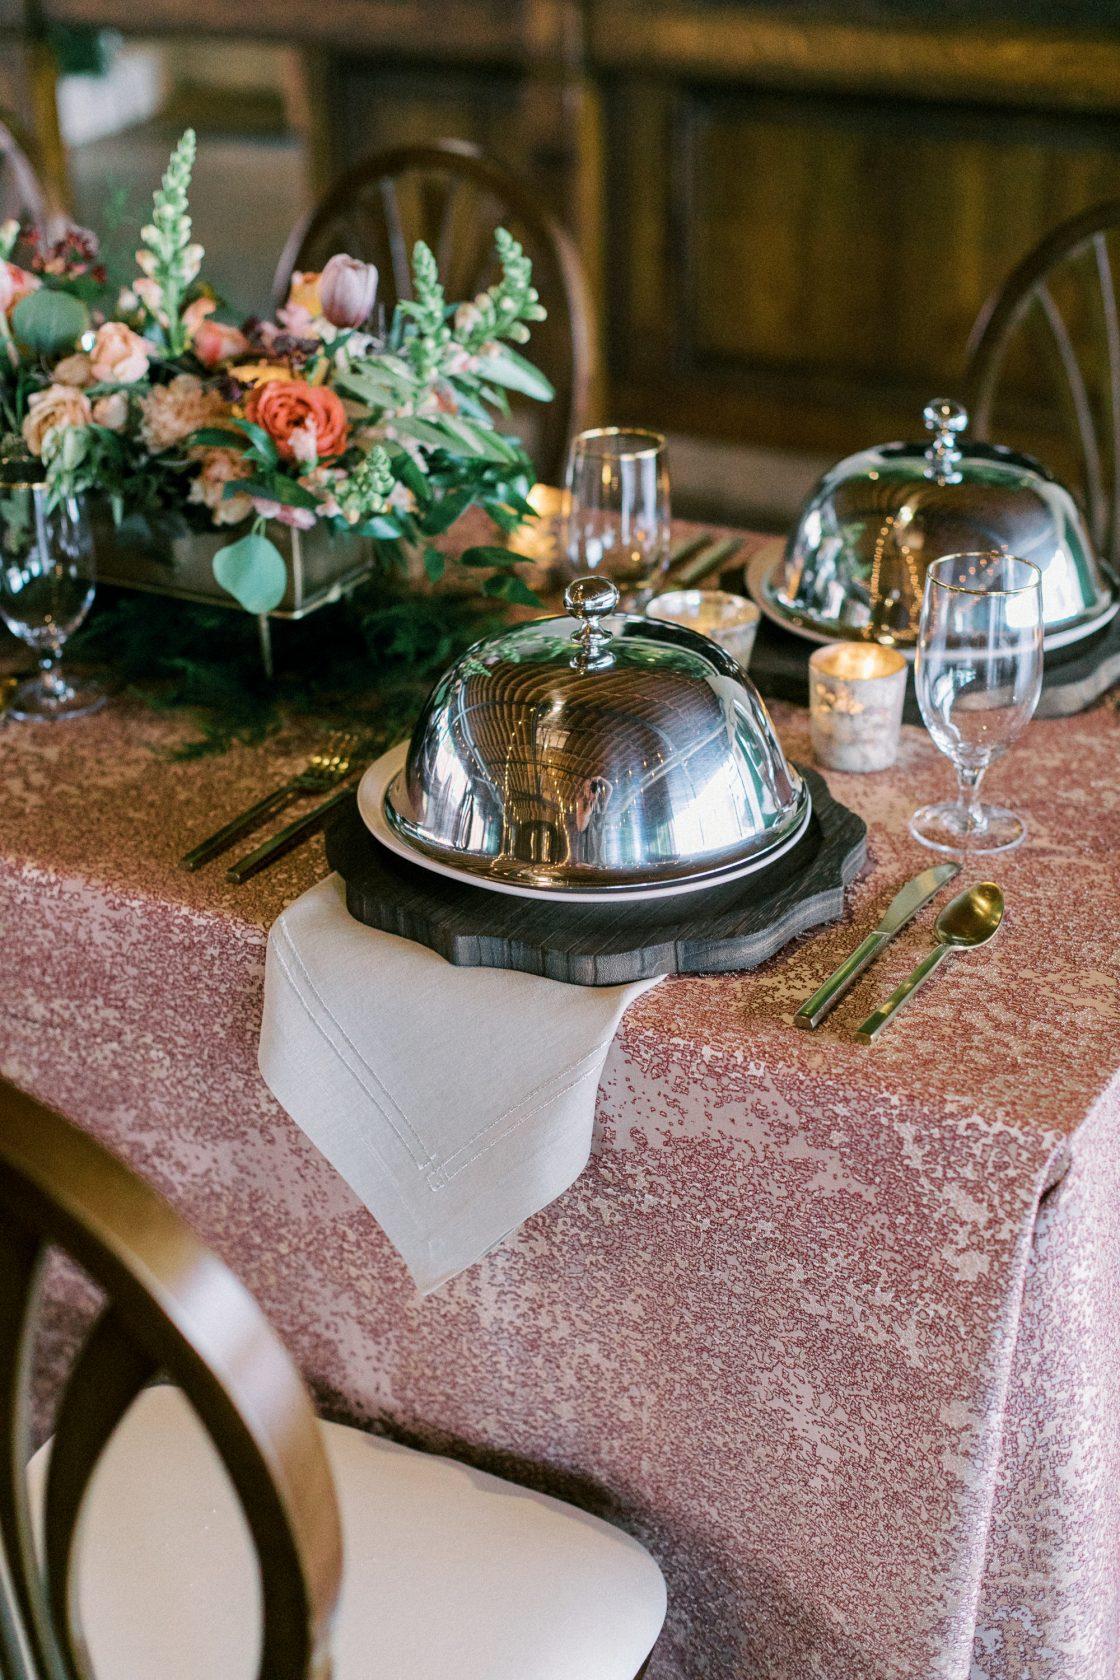 White Glove Wedding Reception Service Domed Plates